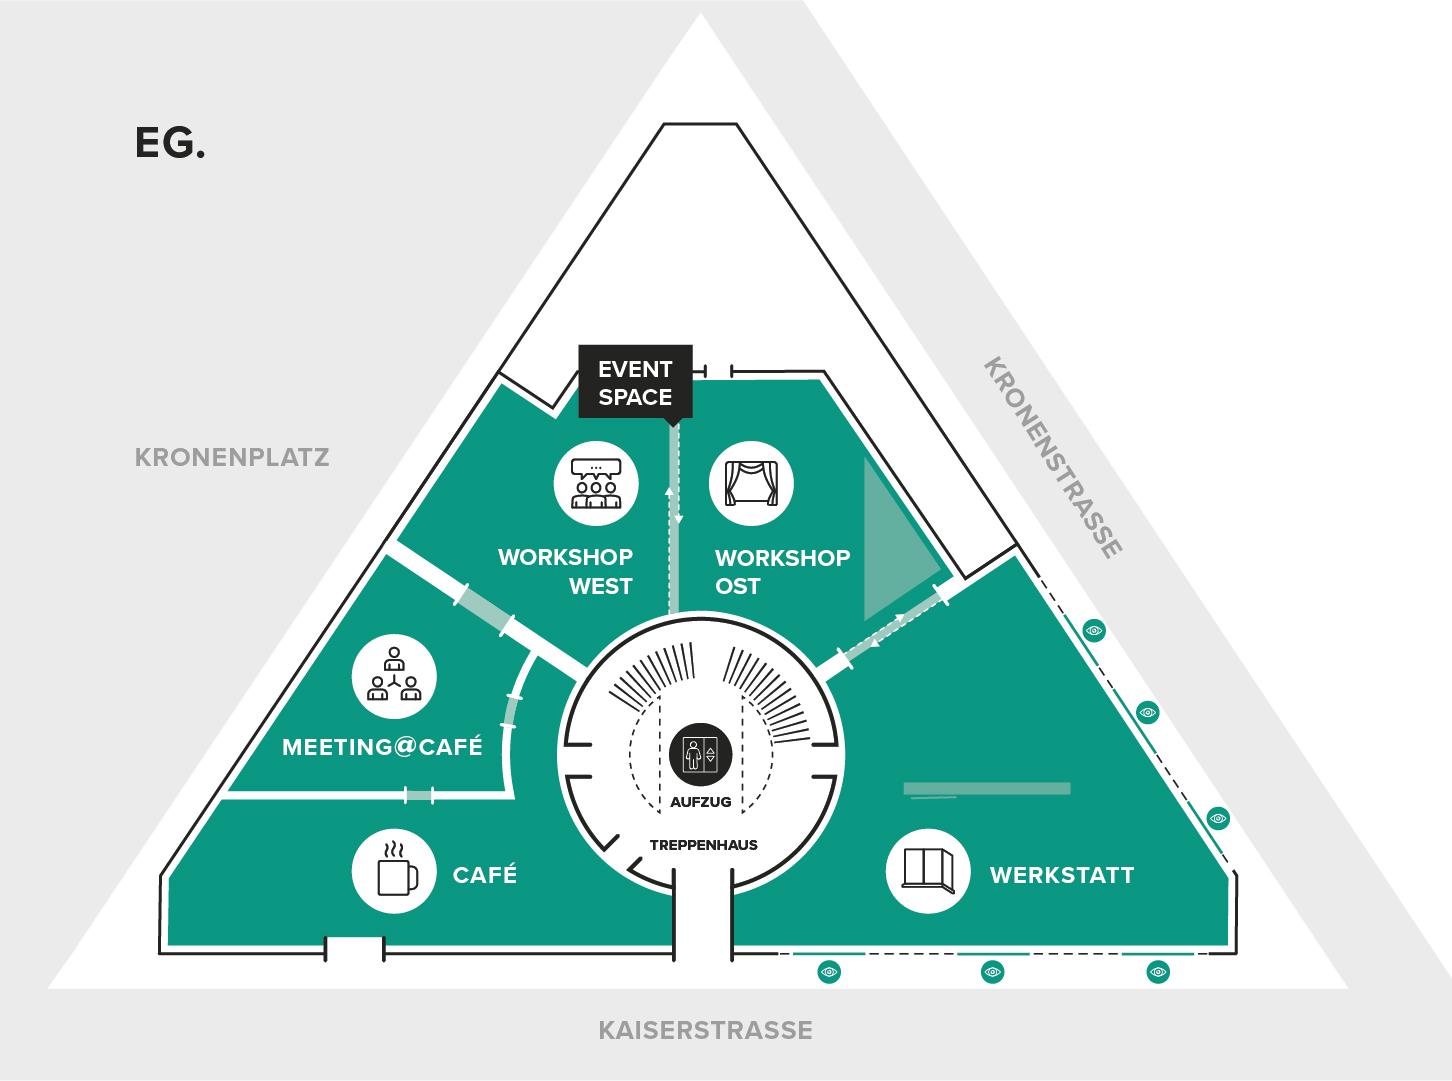 Bild: Grundriss vom TRIANGEL Open Space: Erdgeschoss